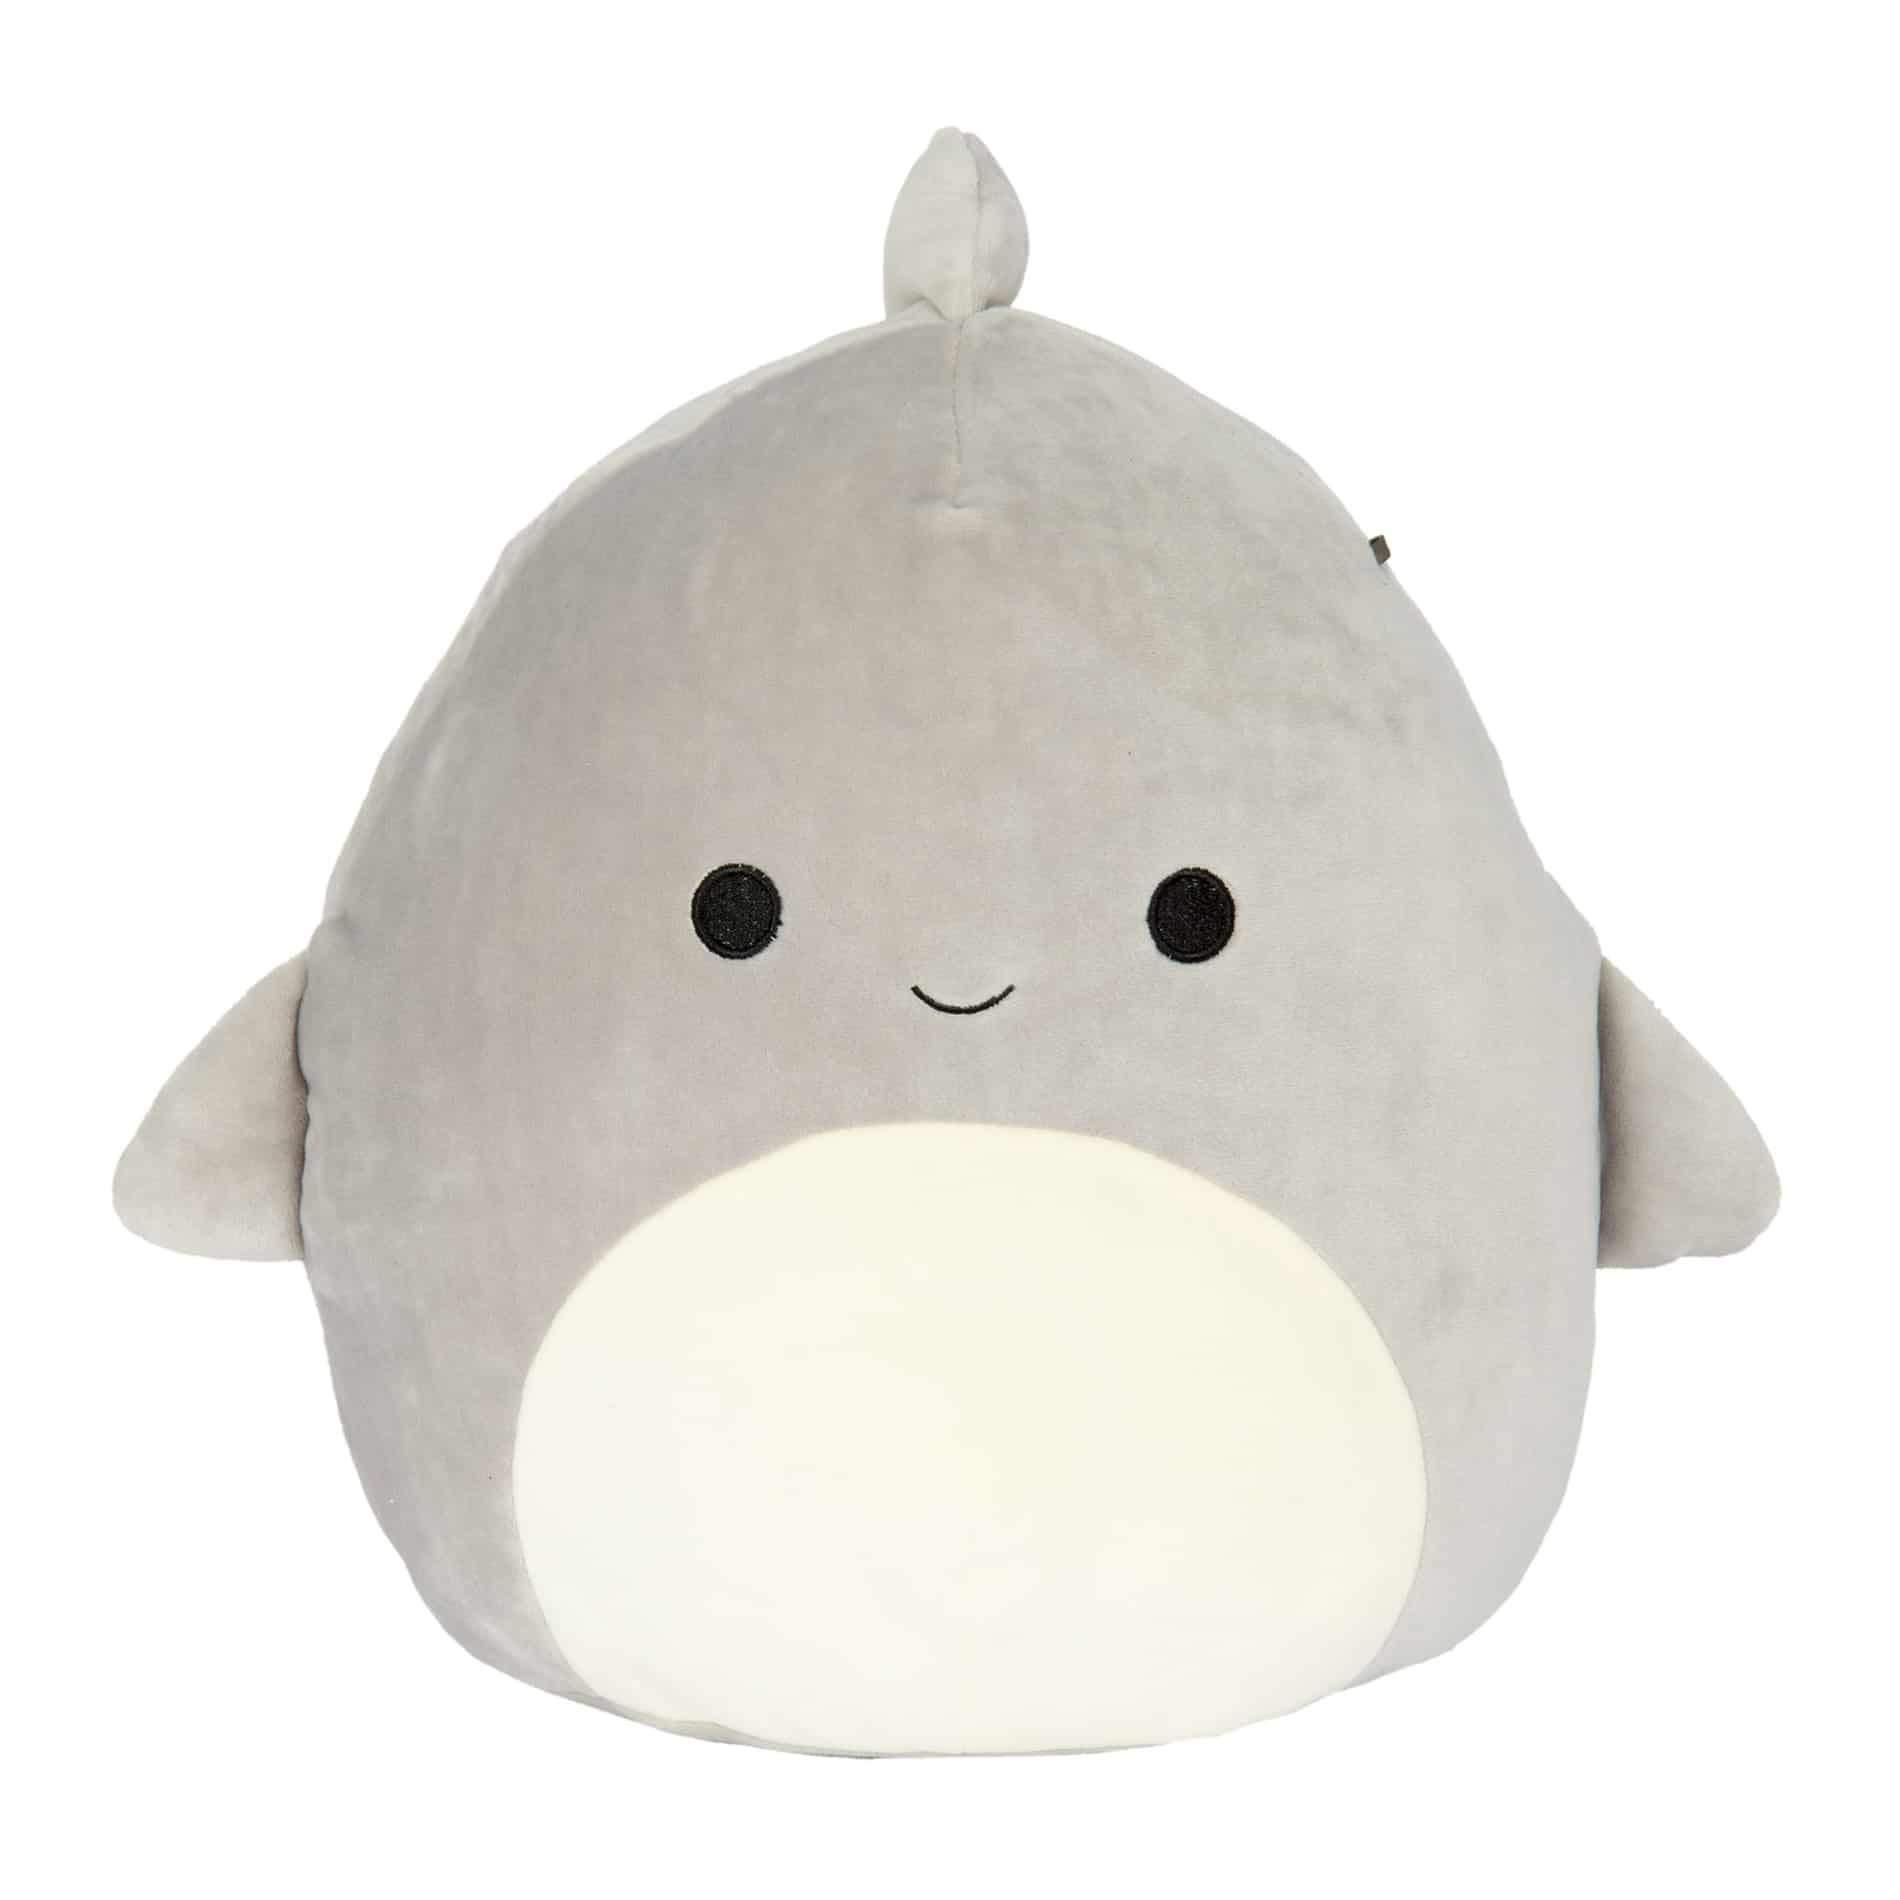 Squishmallow Kellytoy Sea Life 16'' Gordon The Shark- Super Soft Plush Toy Pillow Pet Animal Pillow Pal Buddy Stuffed Animal Birthday Gift Holiday Spring Easter